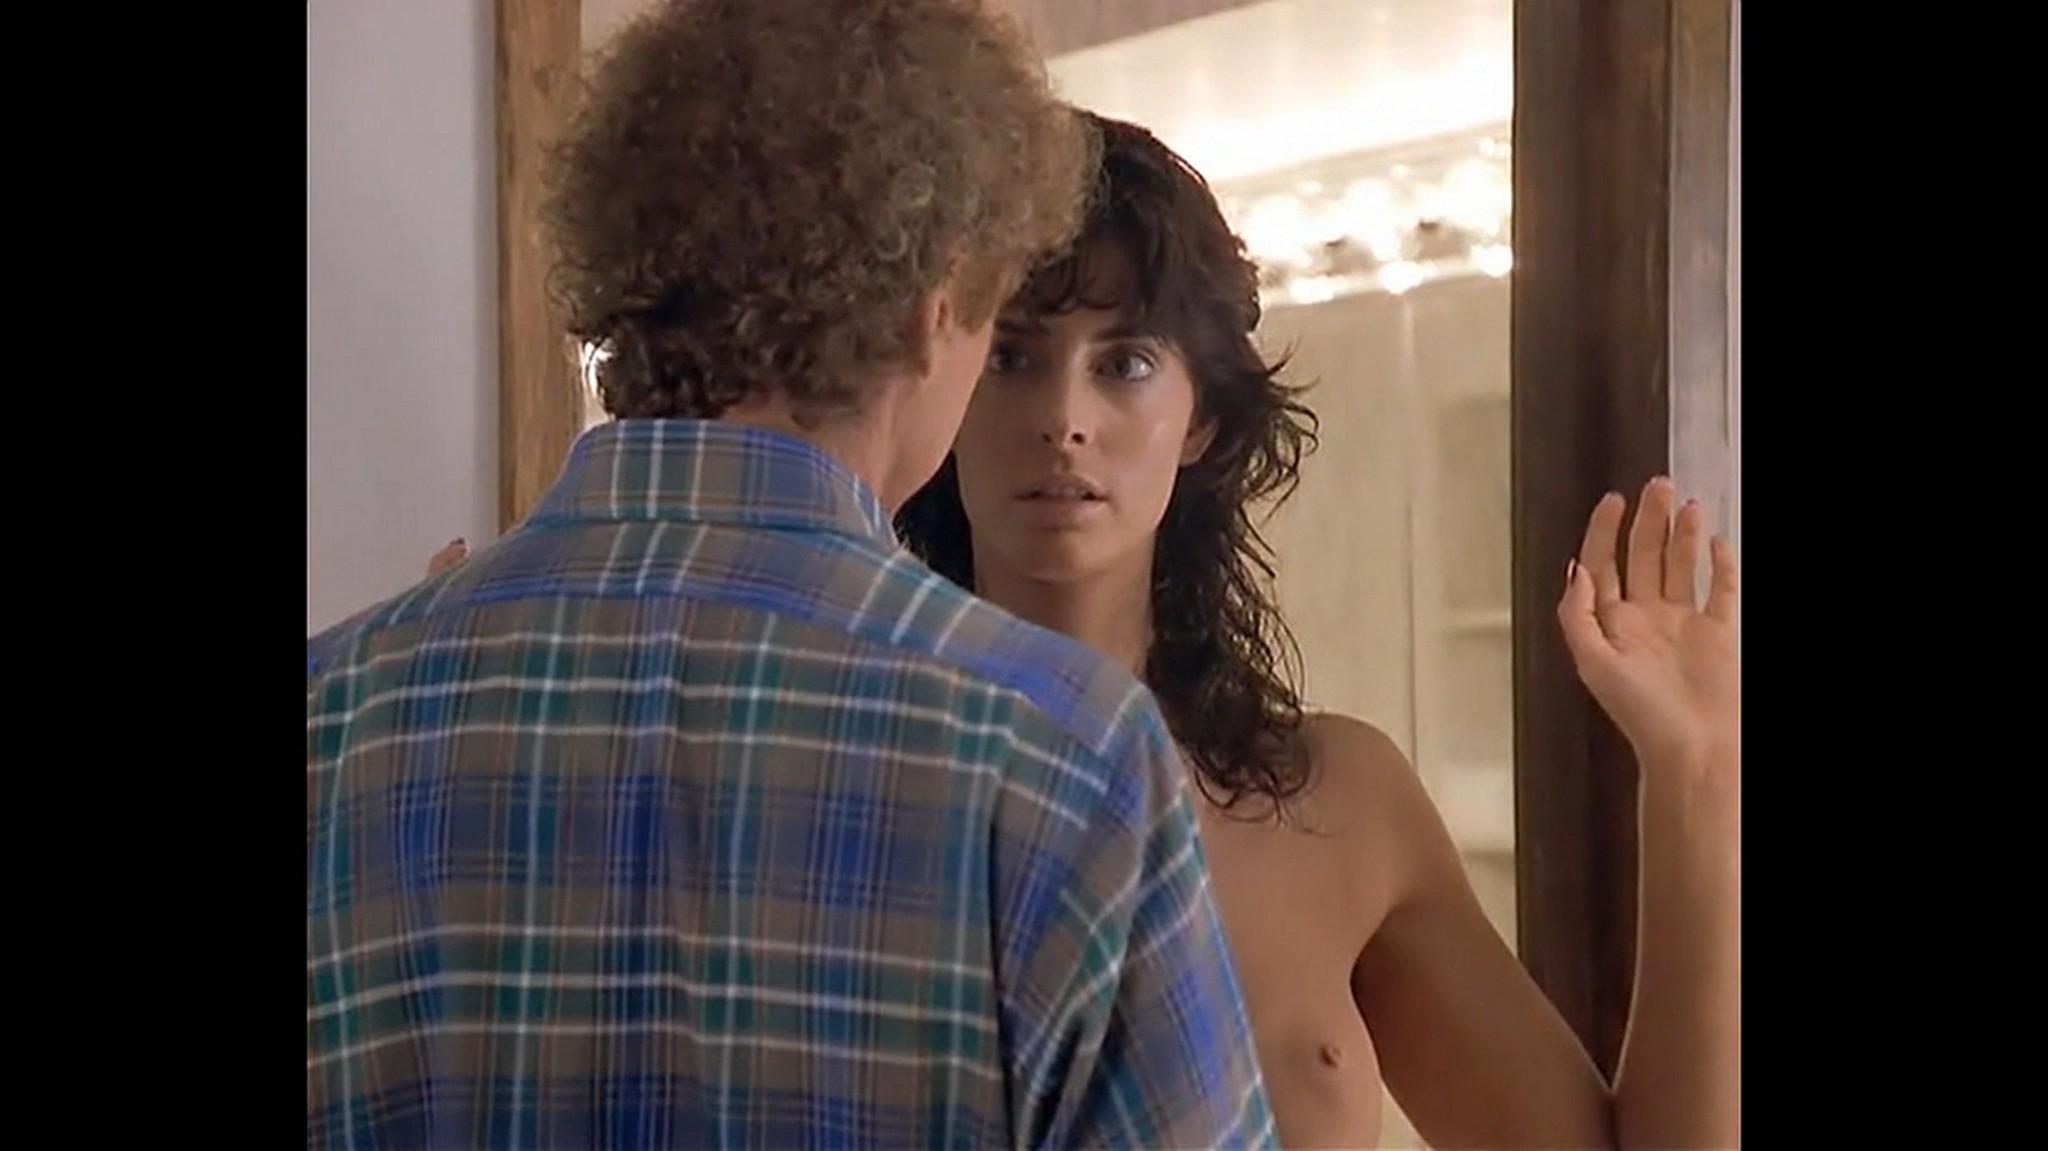 Joan Severance nude topless - See No Evil Hear No Evil (1989) HD 720/1080p (14)